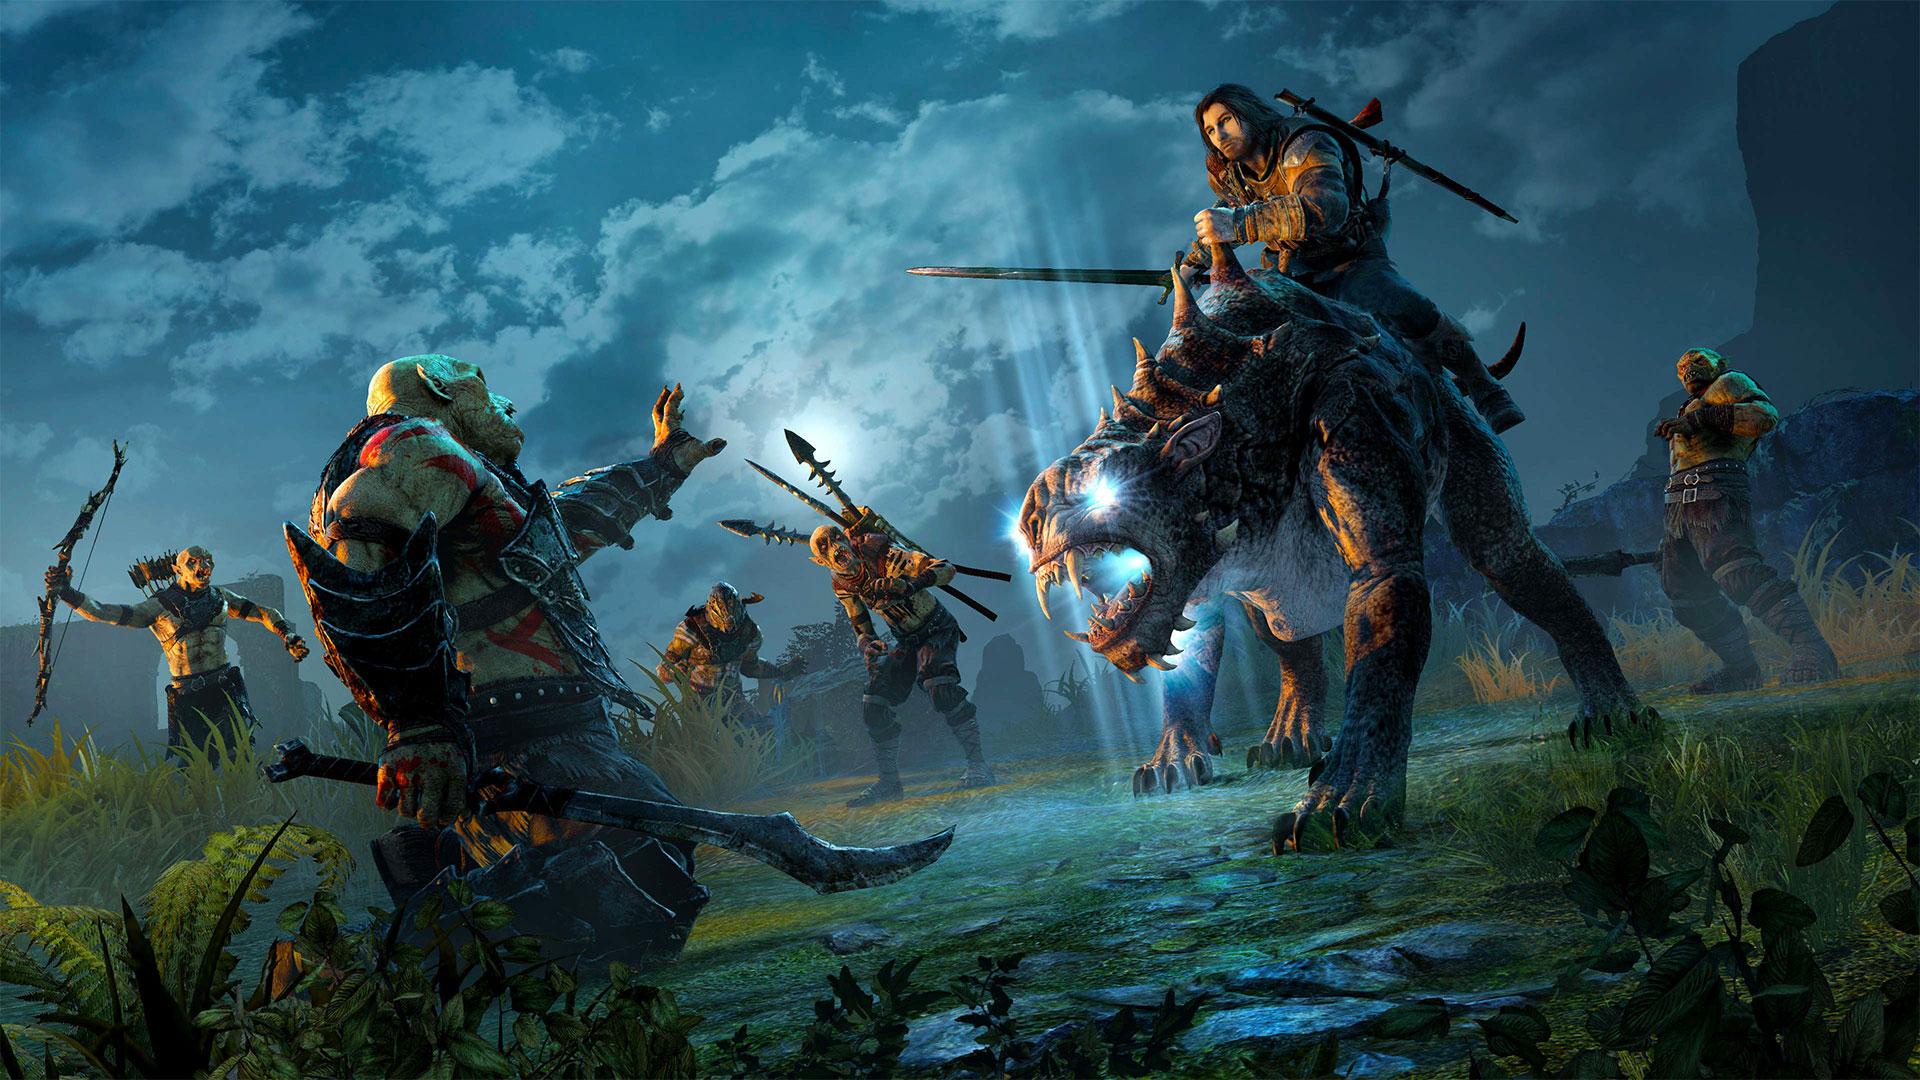 Анонсировано полное издание Middle-earth: Shadow of War